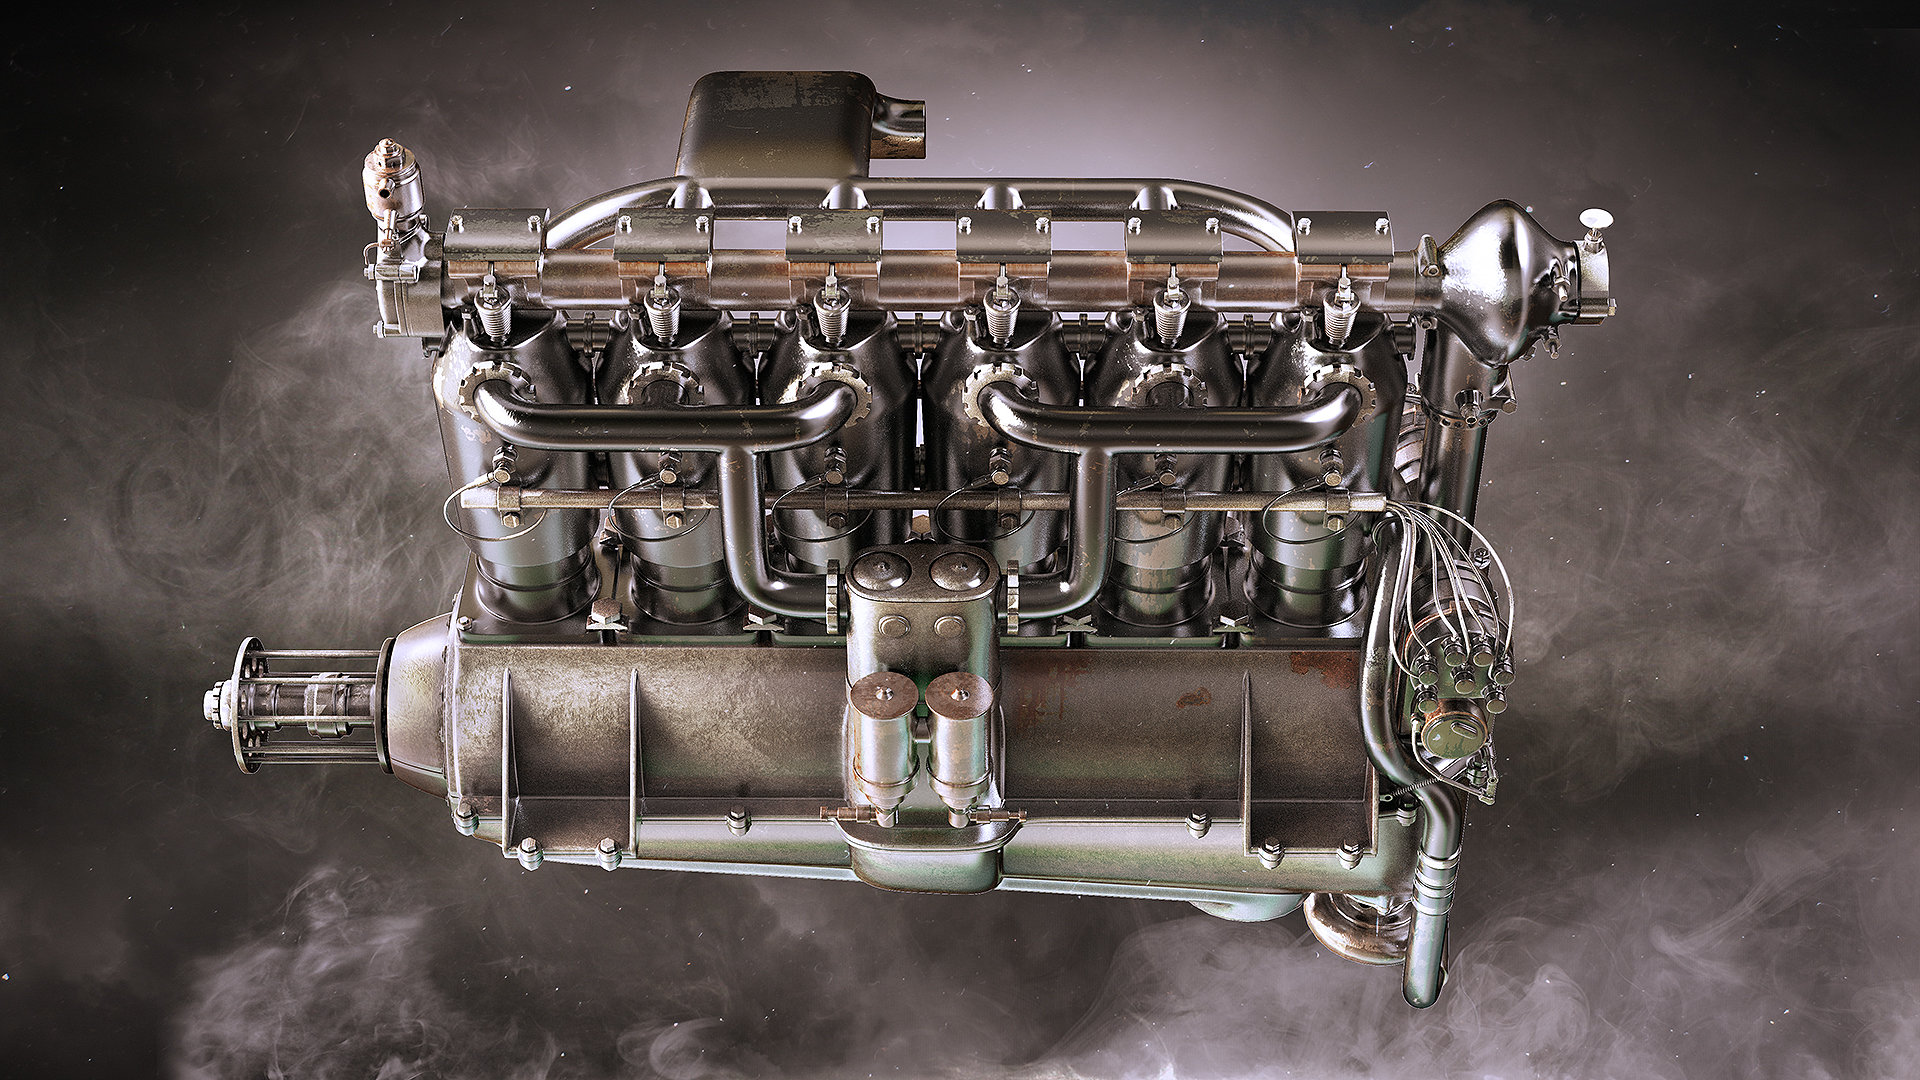 Alexandr novitskiy mercedes diii engine 04